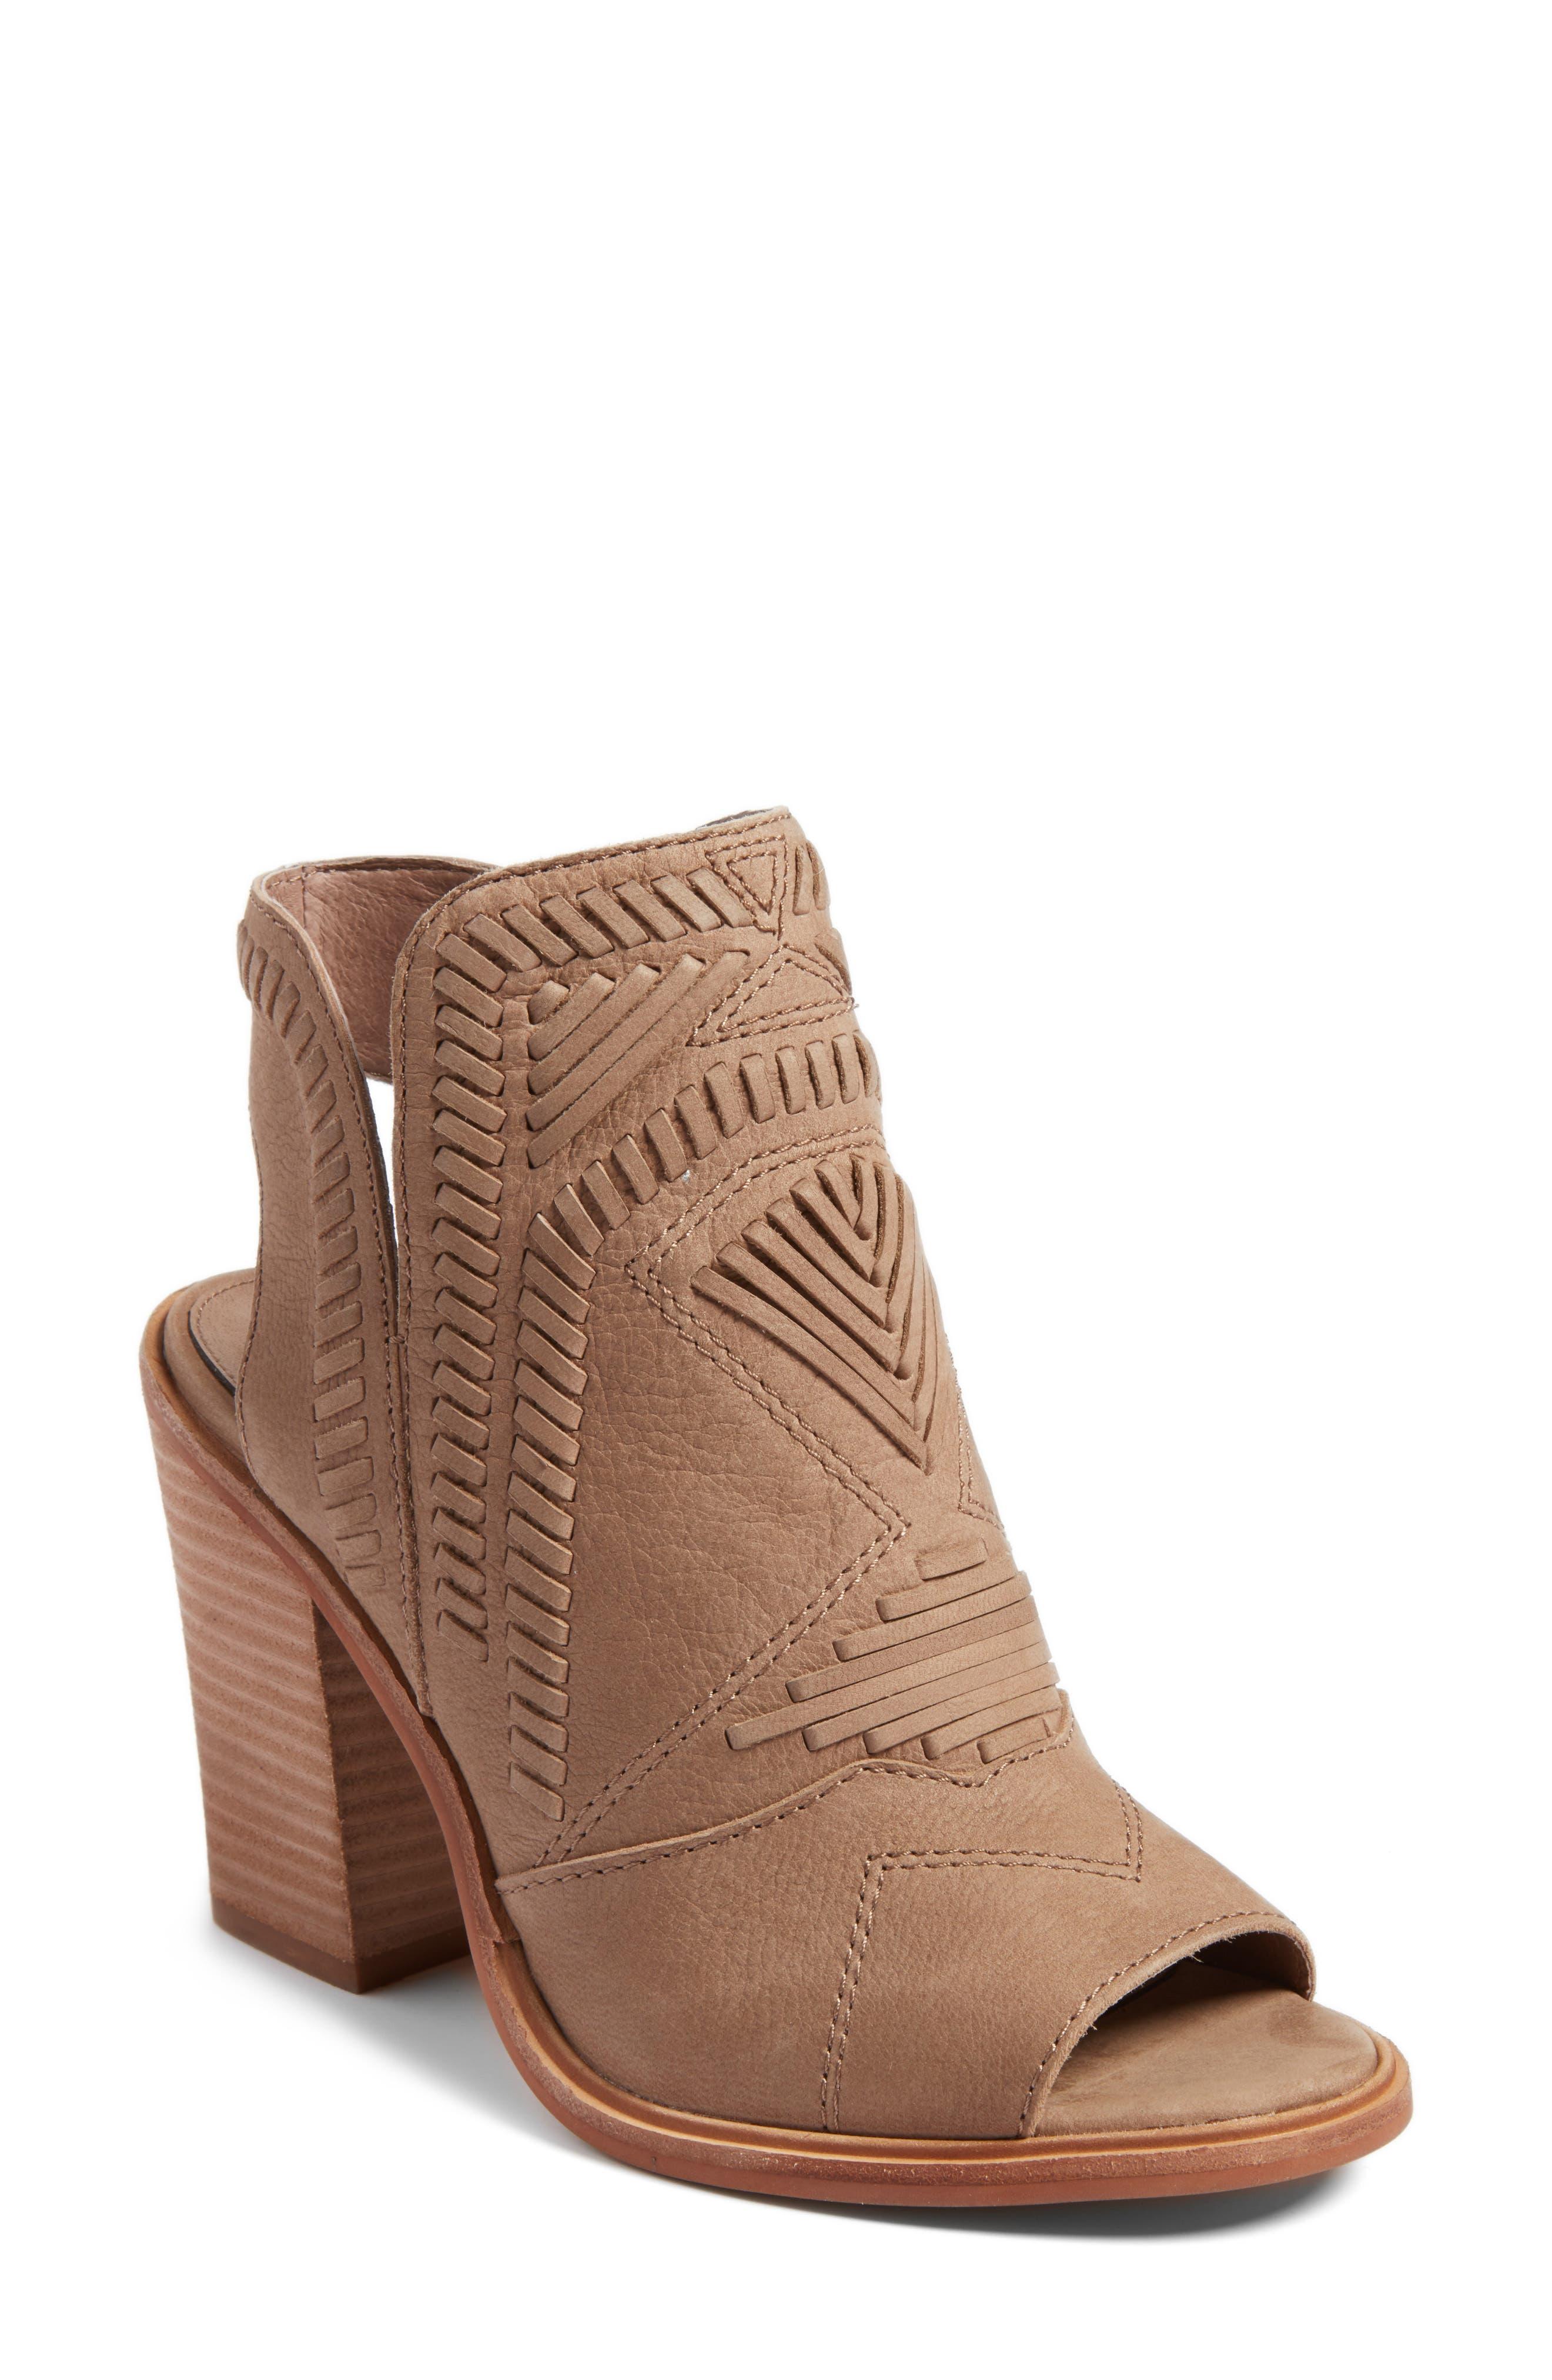 Womens Heels Hyper Online 49561770 Pedro Garcia Striped Suede Wedge